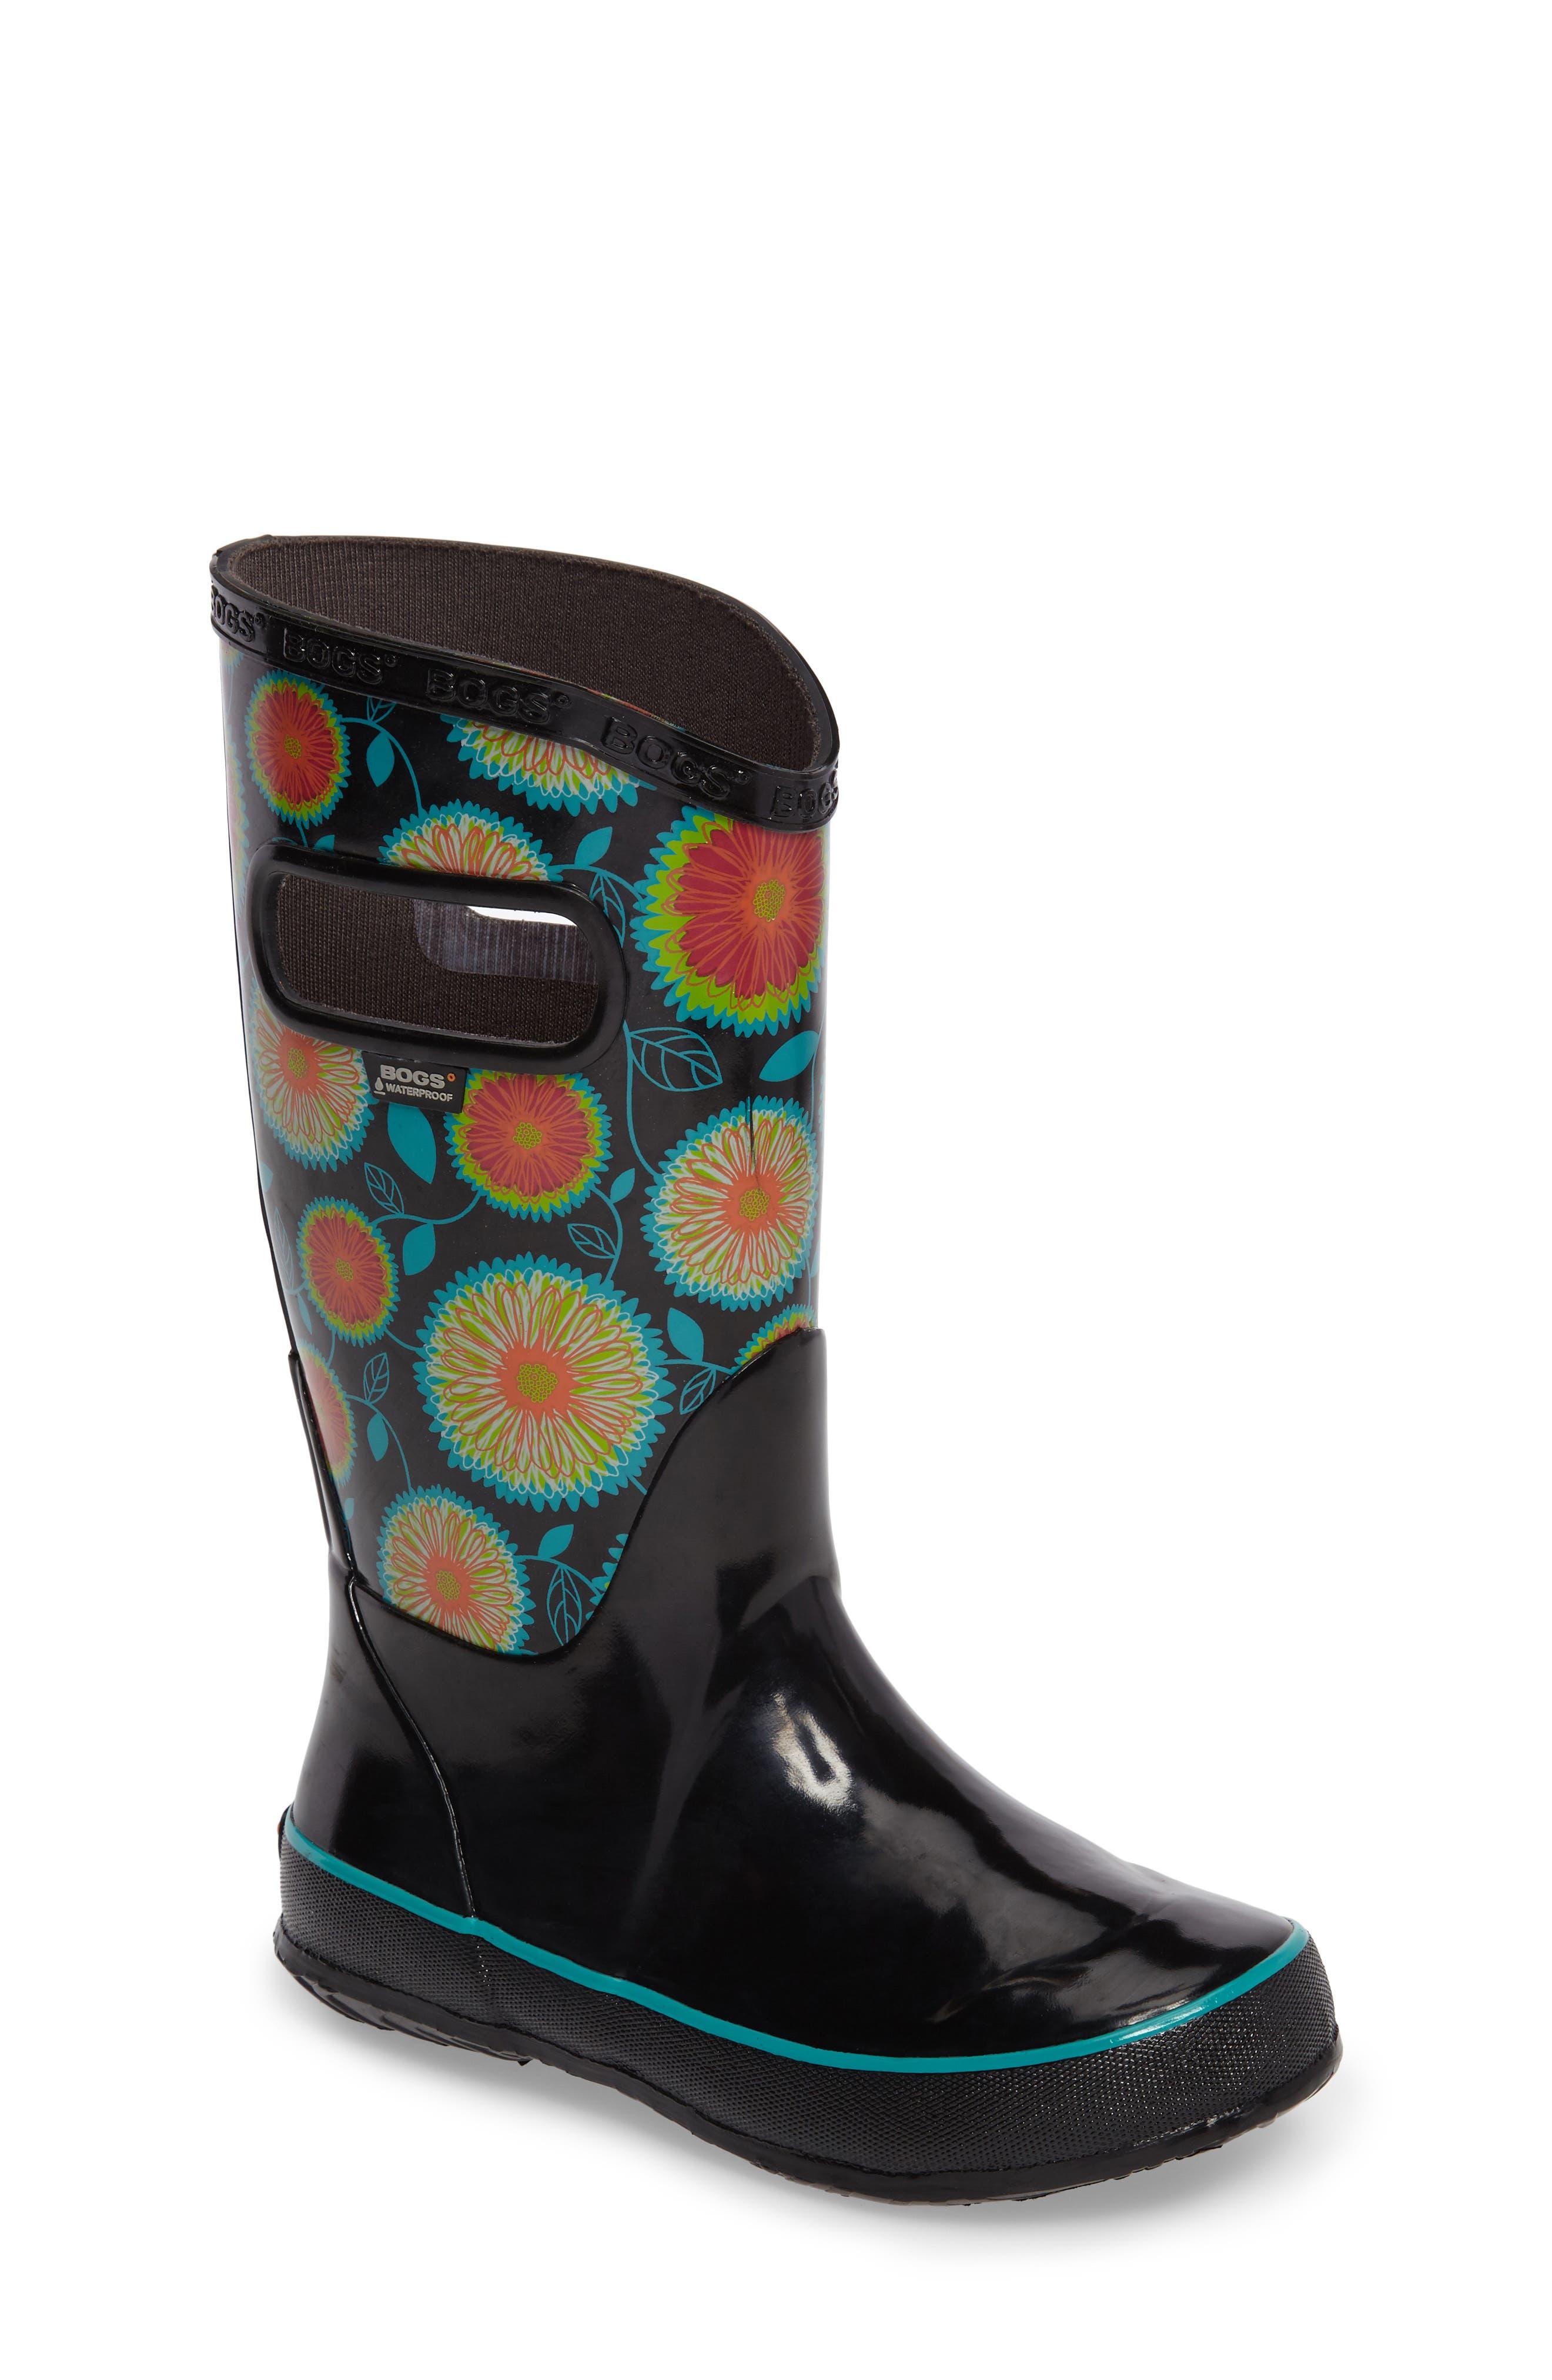 Wildflowers Waterproof Rubber Rain Boot,                             Main thumbnail 1, color,                             Black Multi